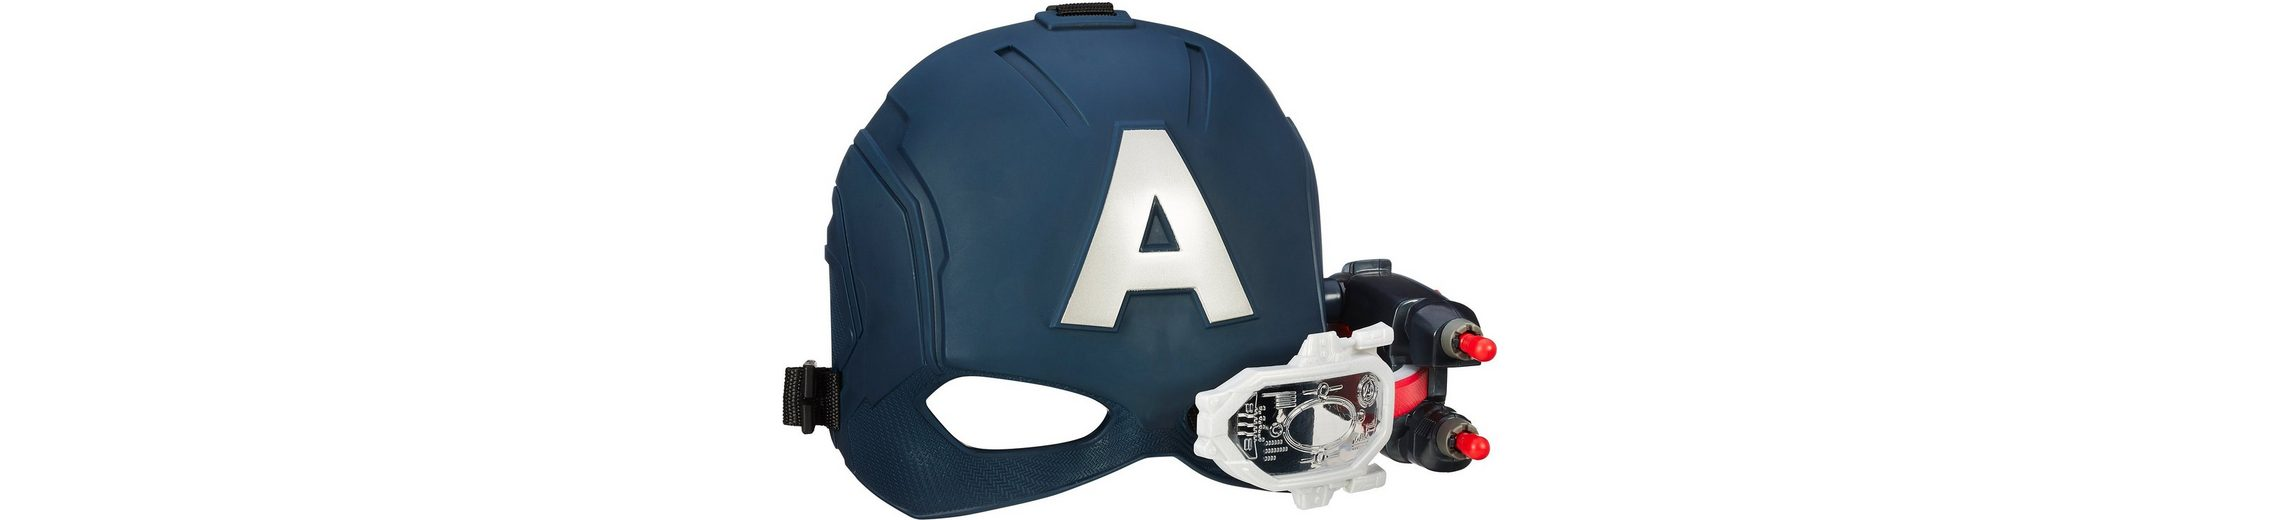 Hasbro Kostümzubehör, »Marvel Avengers Captain America, Action-Helm«